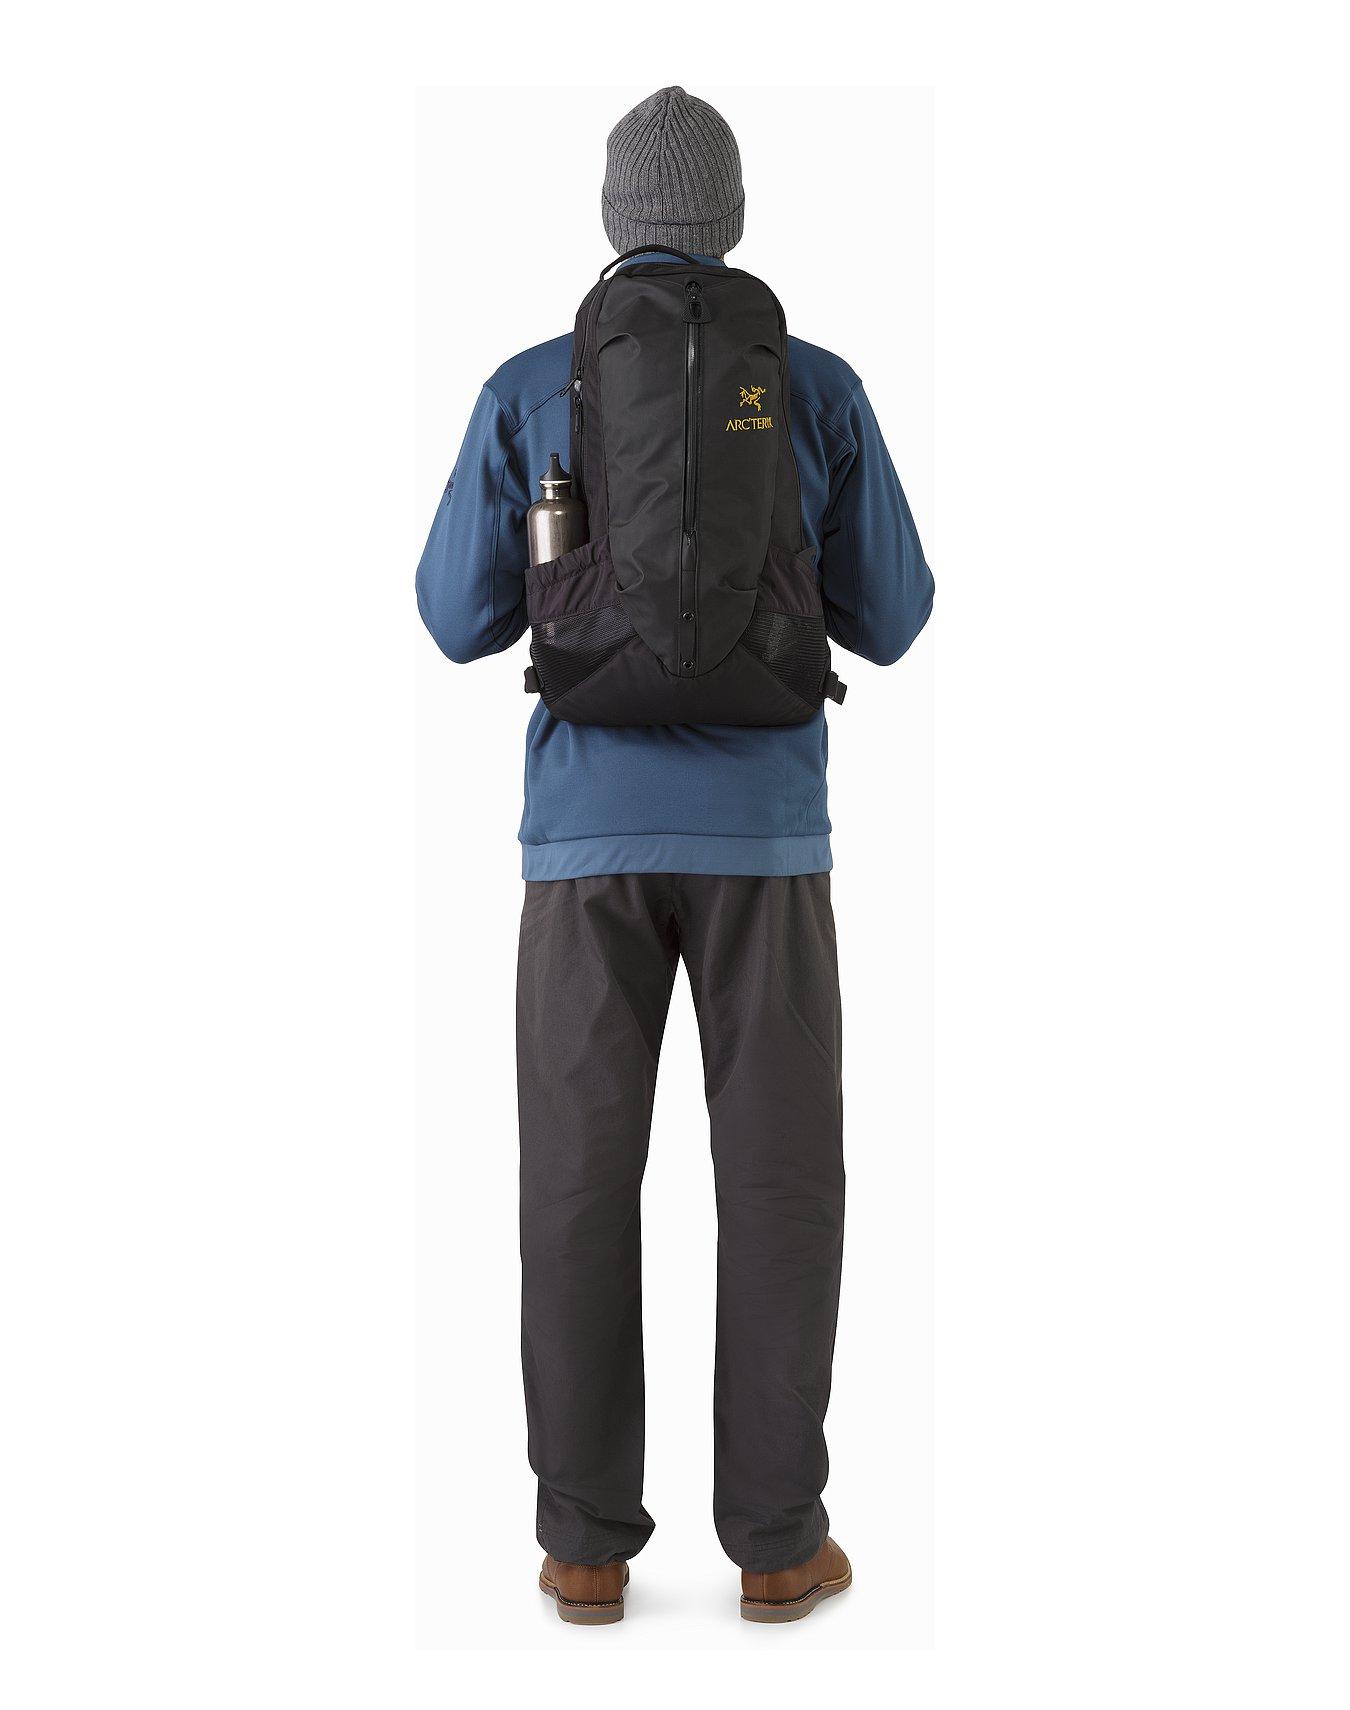 Arro-22-Backpack-Black-Back-View.jpg